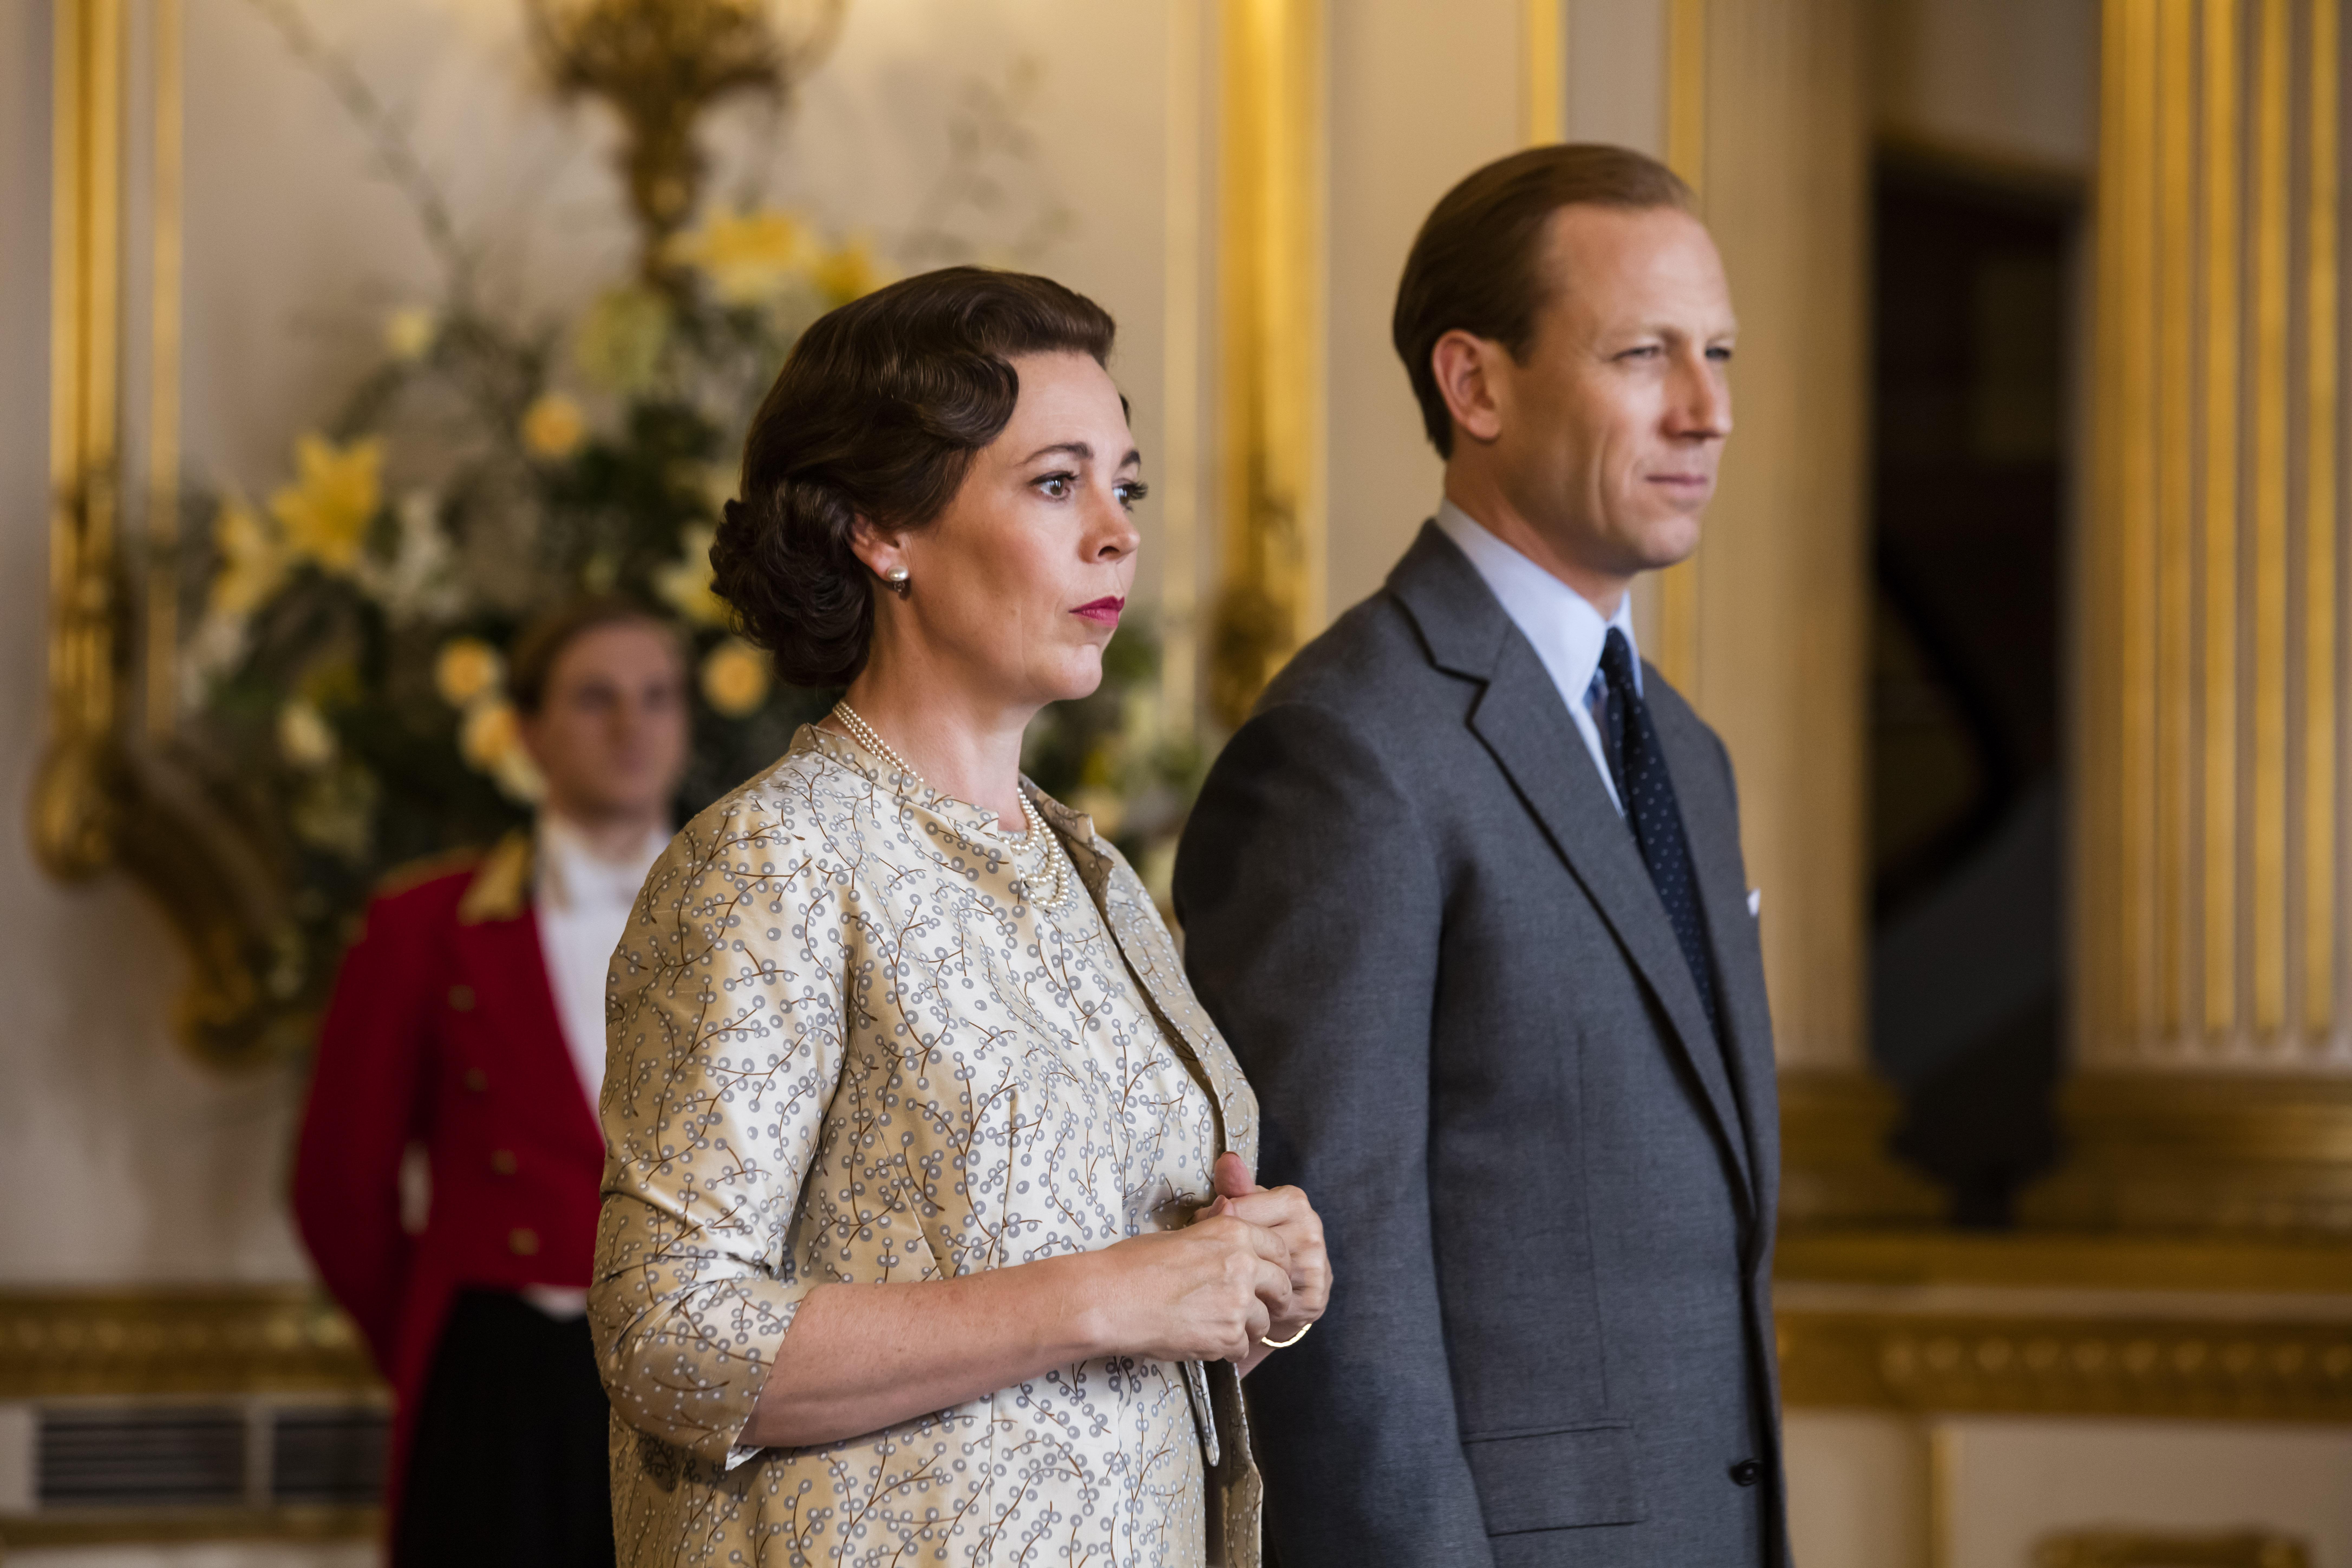 'The Crown': Netflix Royal Drama To End With Season Five As Imelda Staunton Confirmed As Final Queen Elizabeth II